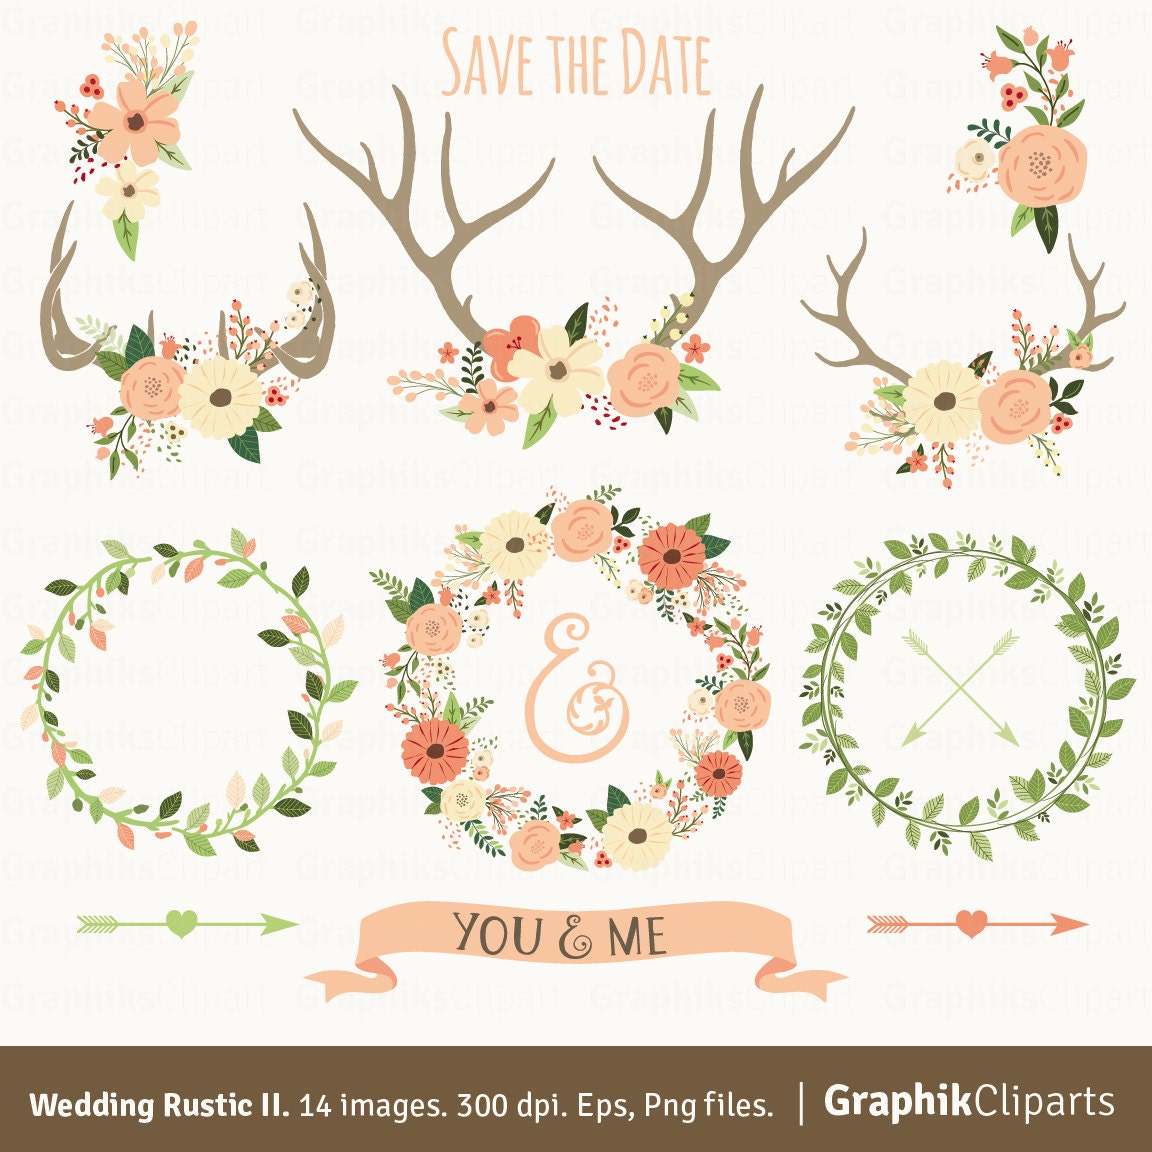 Rustic Wedding Clipart II WEDDING CLIPART Floral